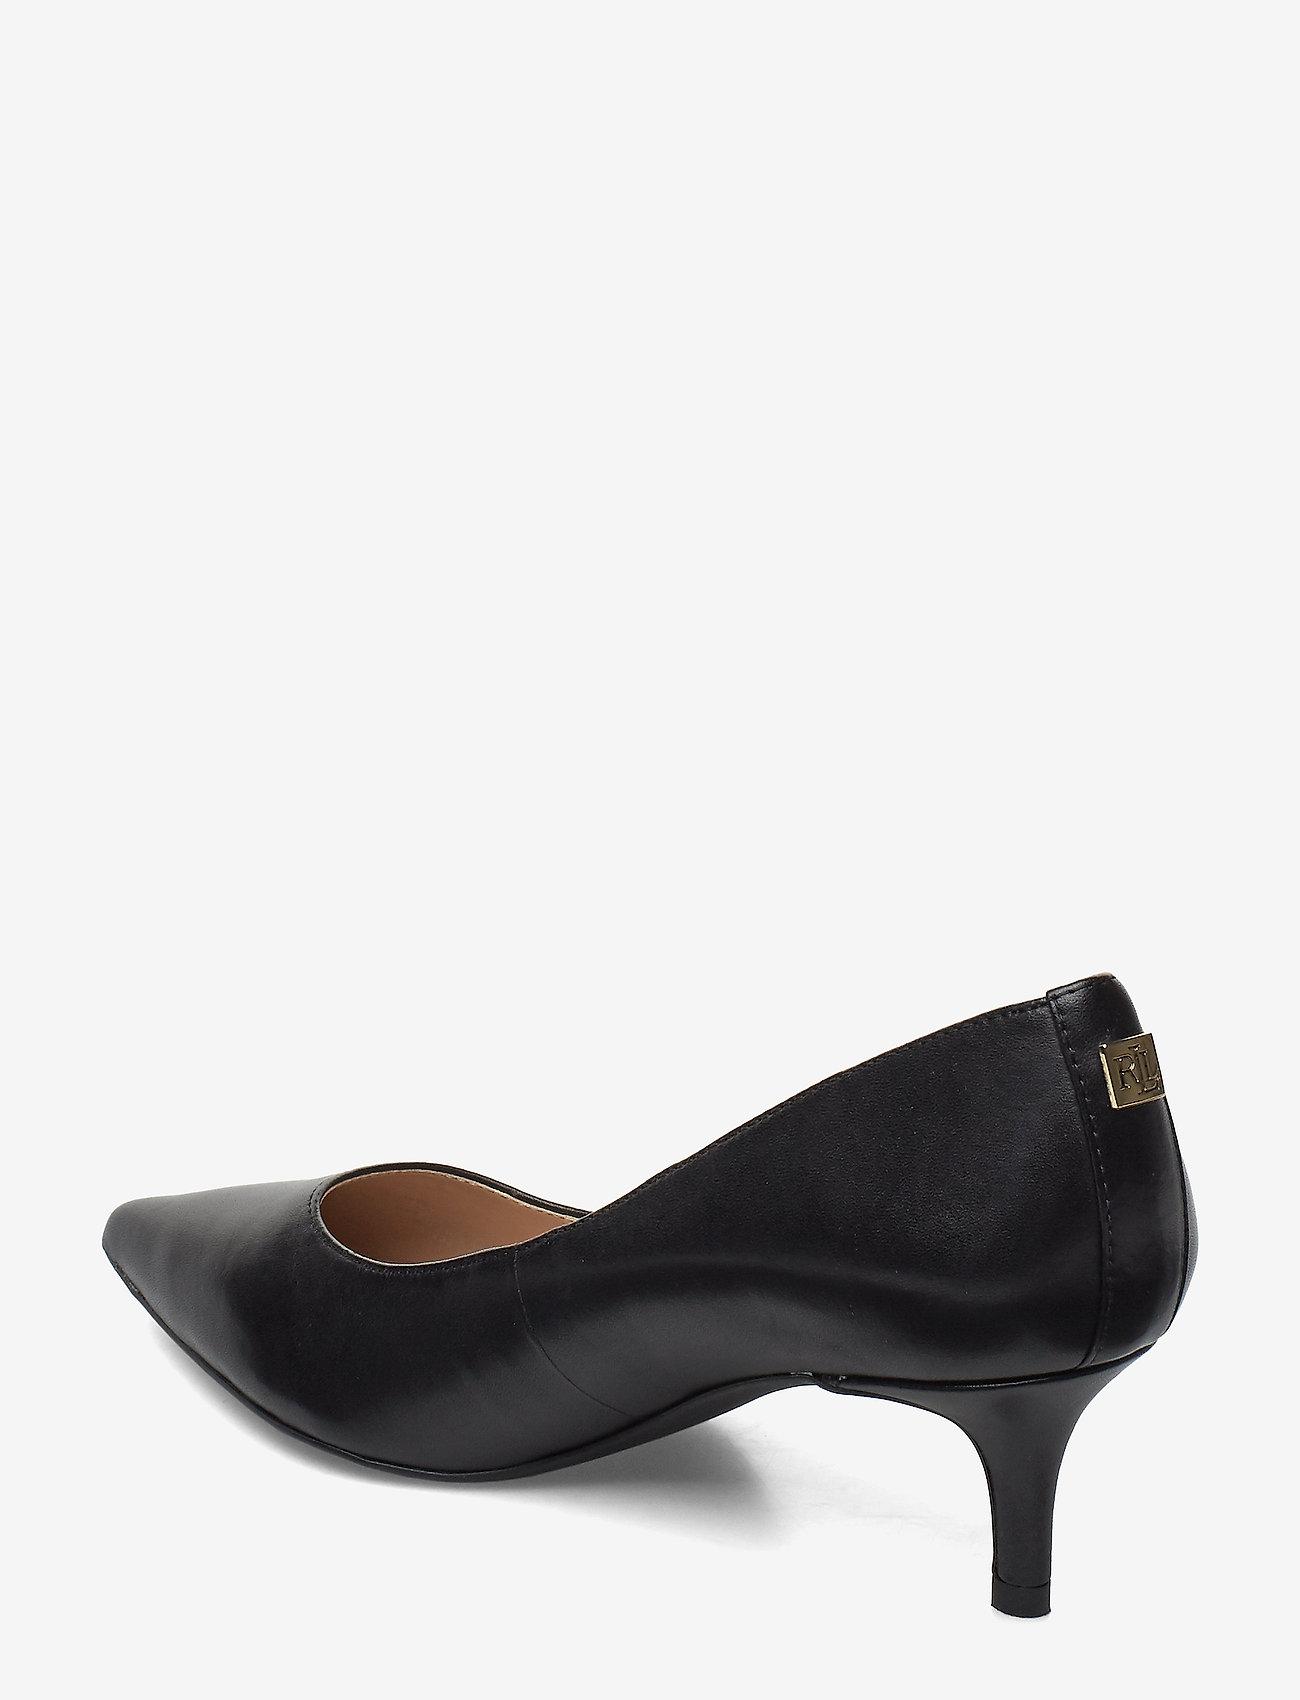 Adrienne Leather Pump (Black) - Lauren Ralph Lauren